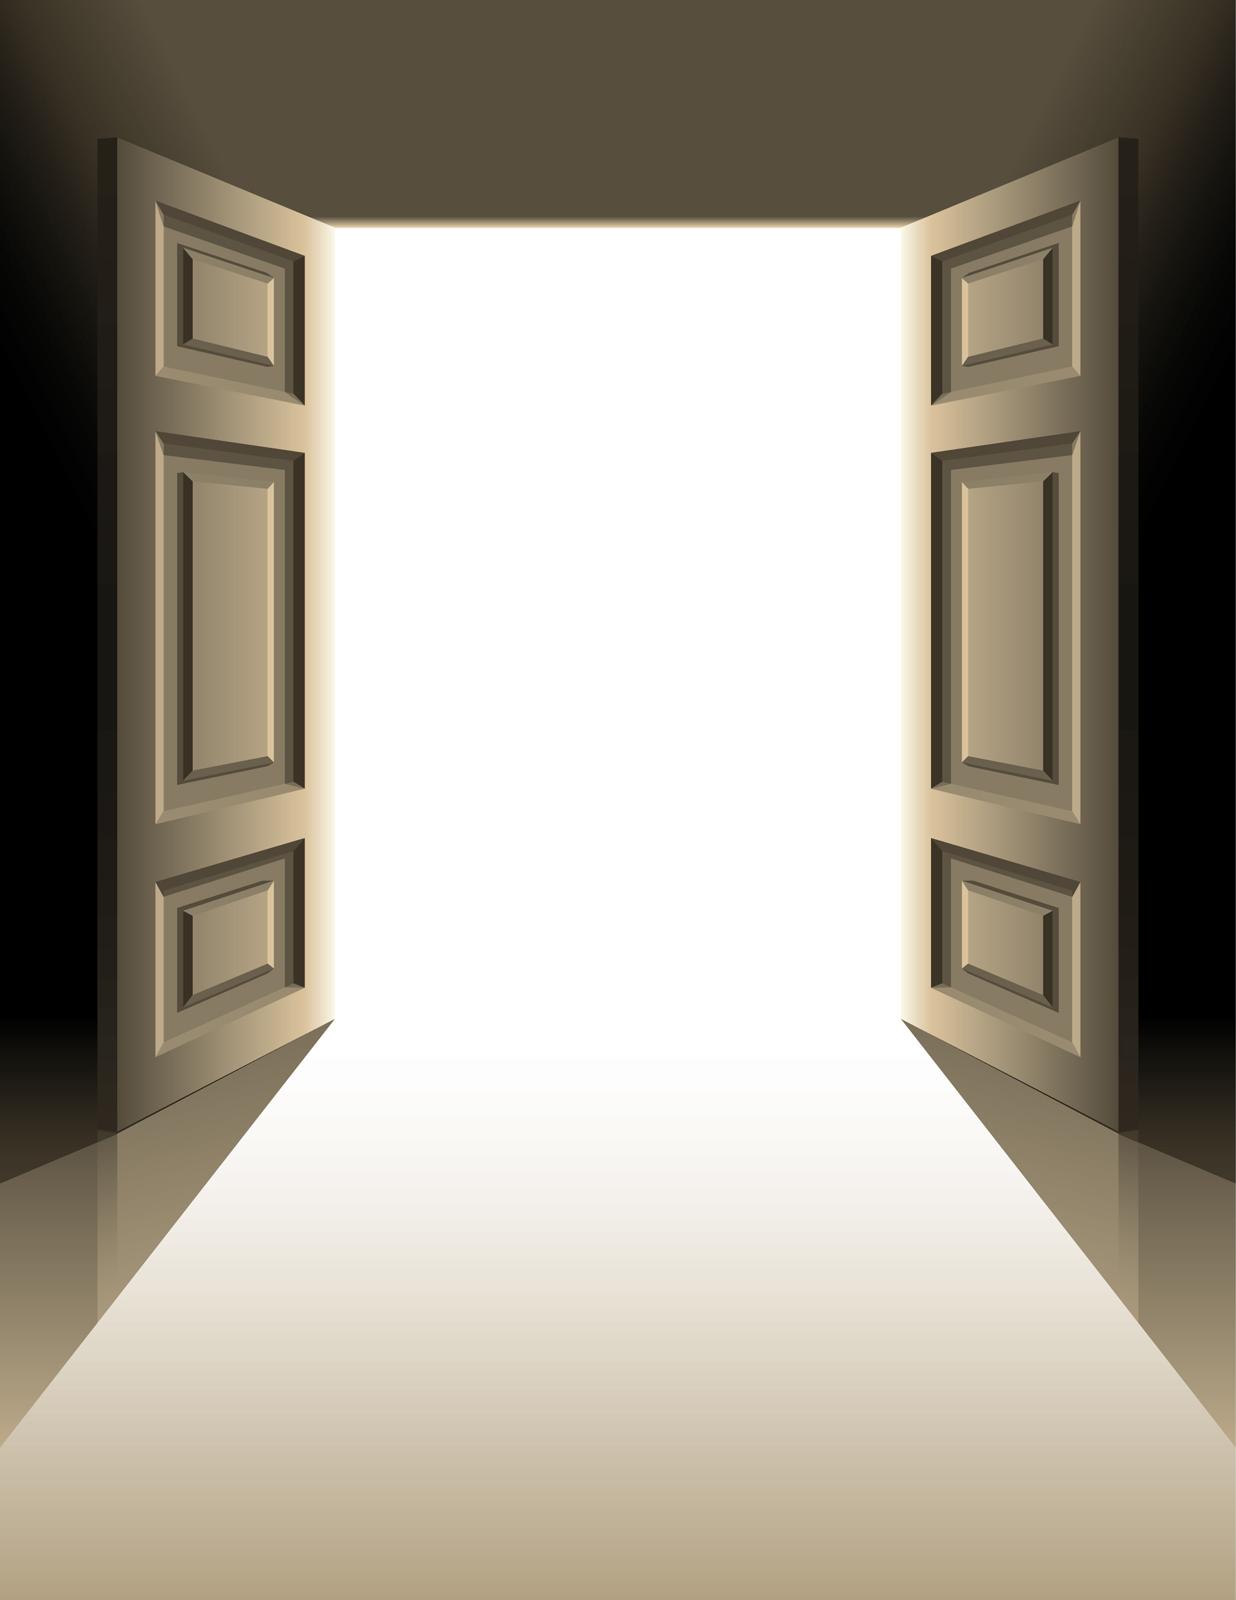 Church Doors Clipart & Church Door Clip Art Black And White.